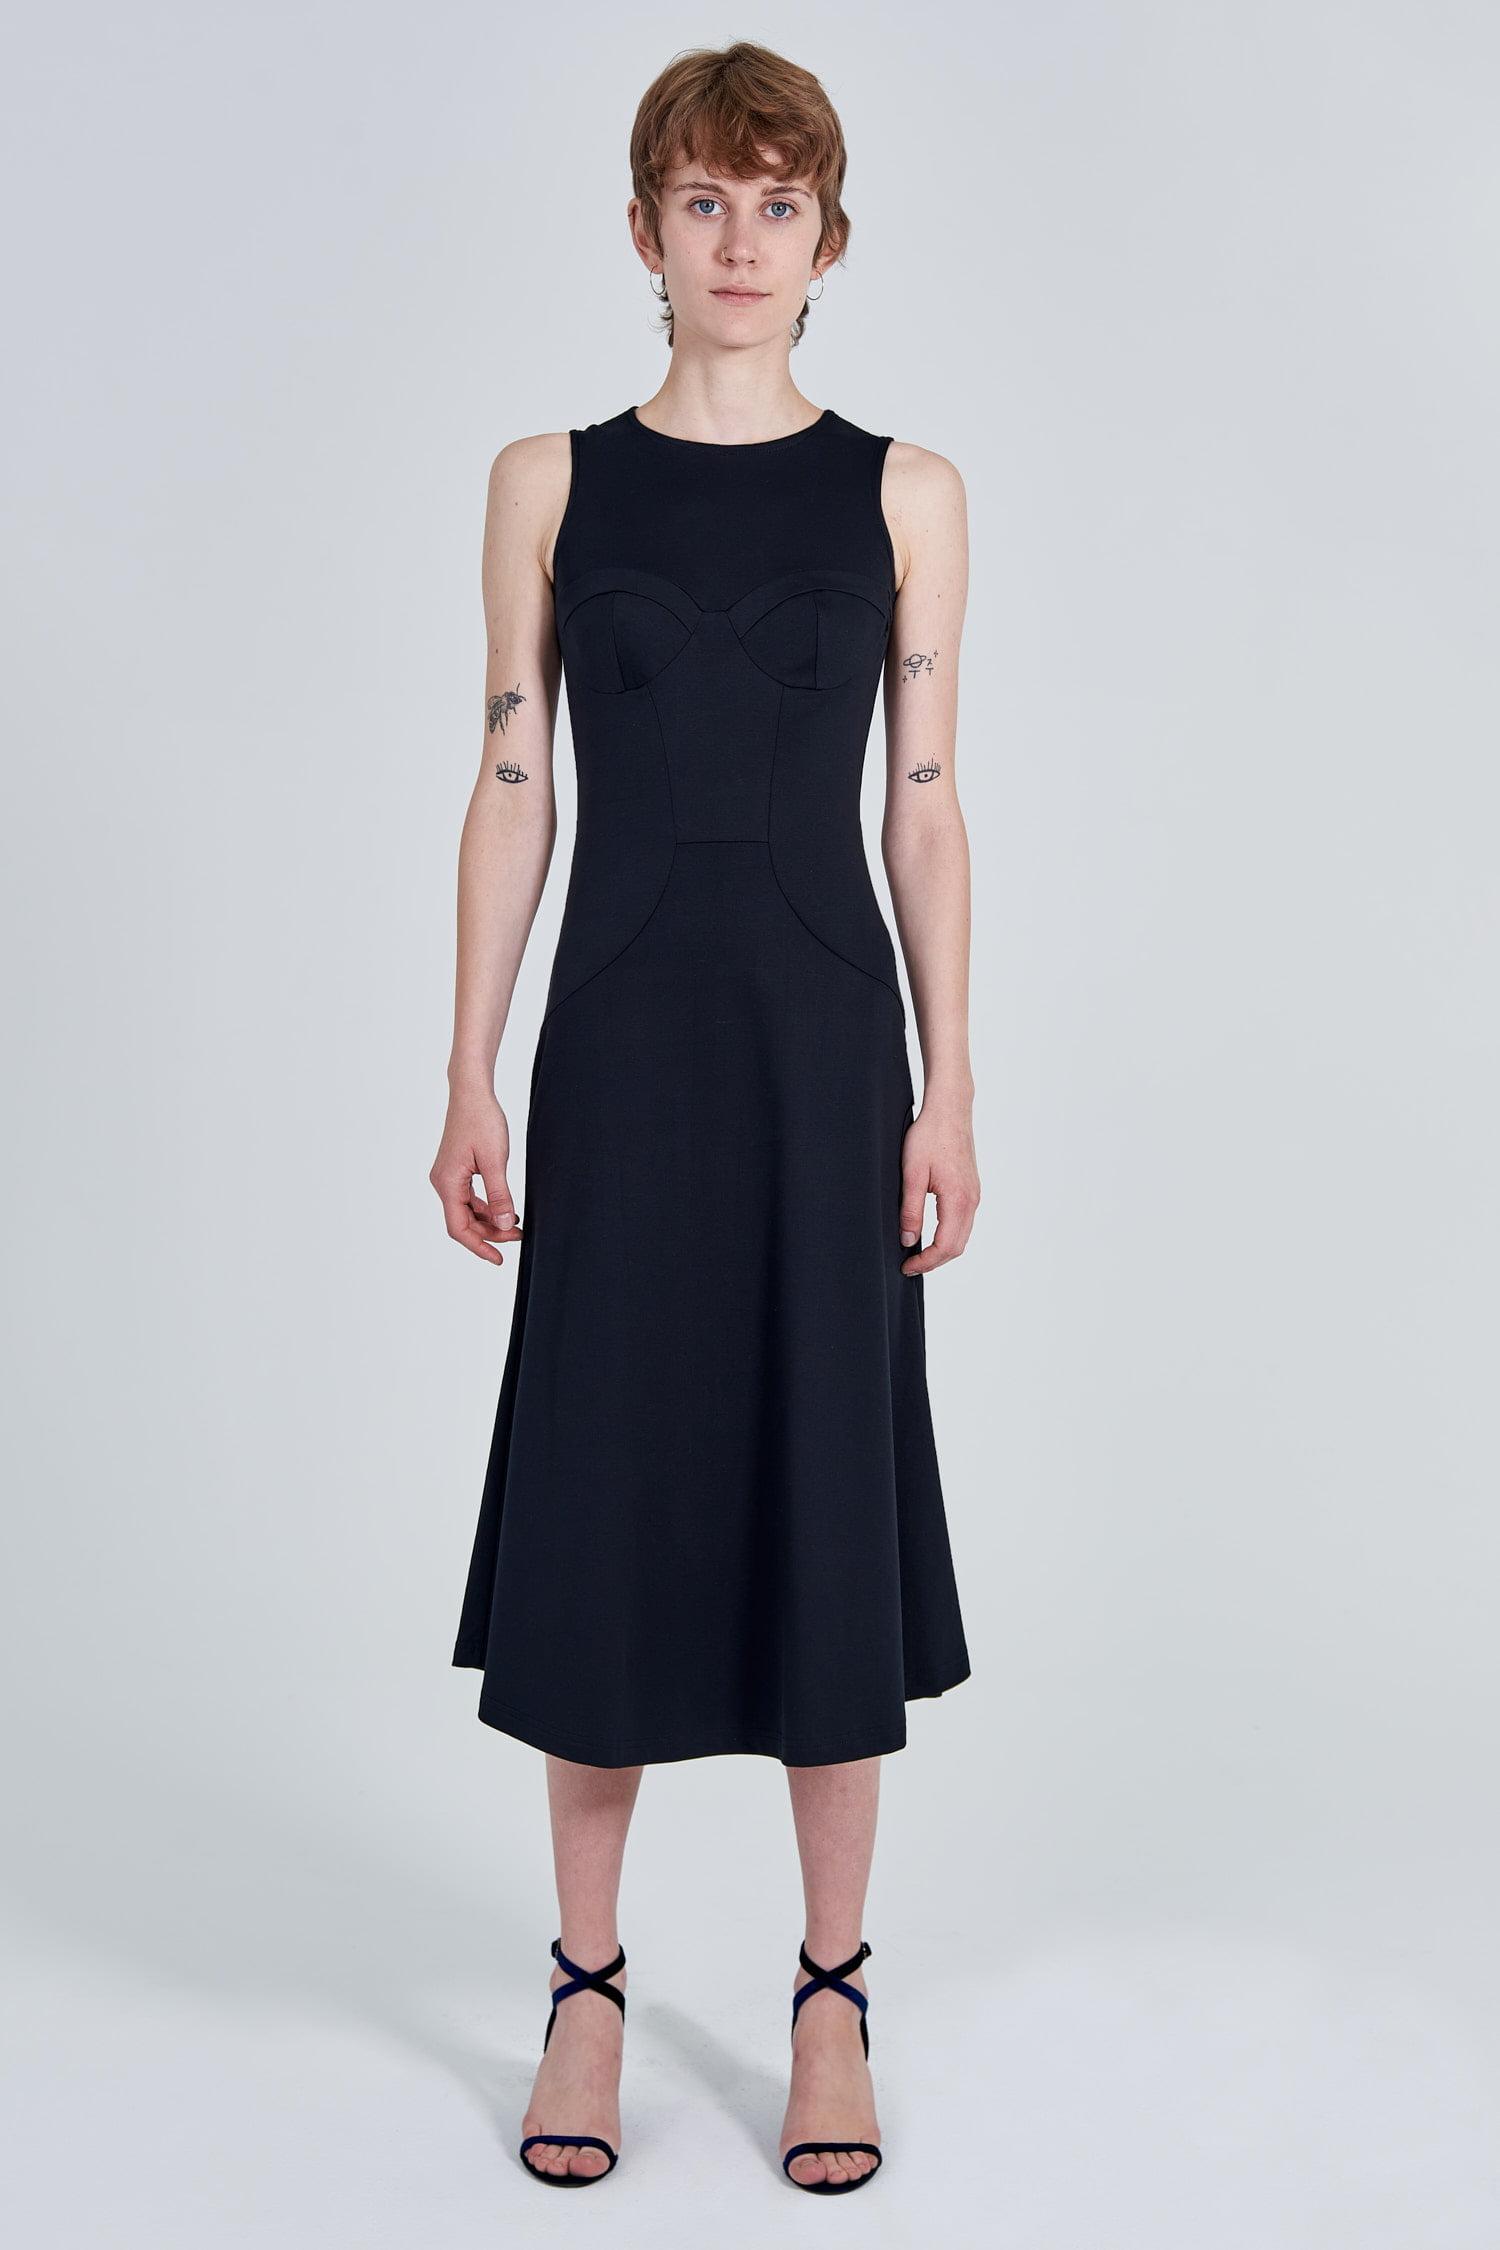 Acephala Fw 2020 21 Black Bustier Midi Dress Front